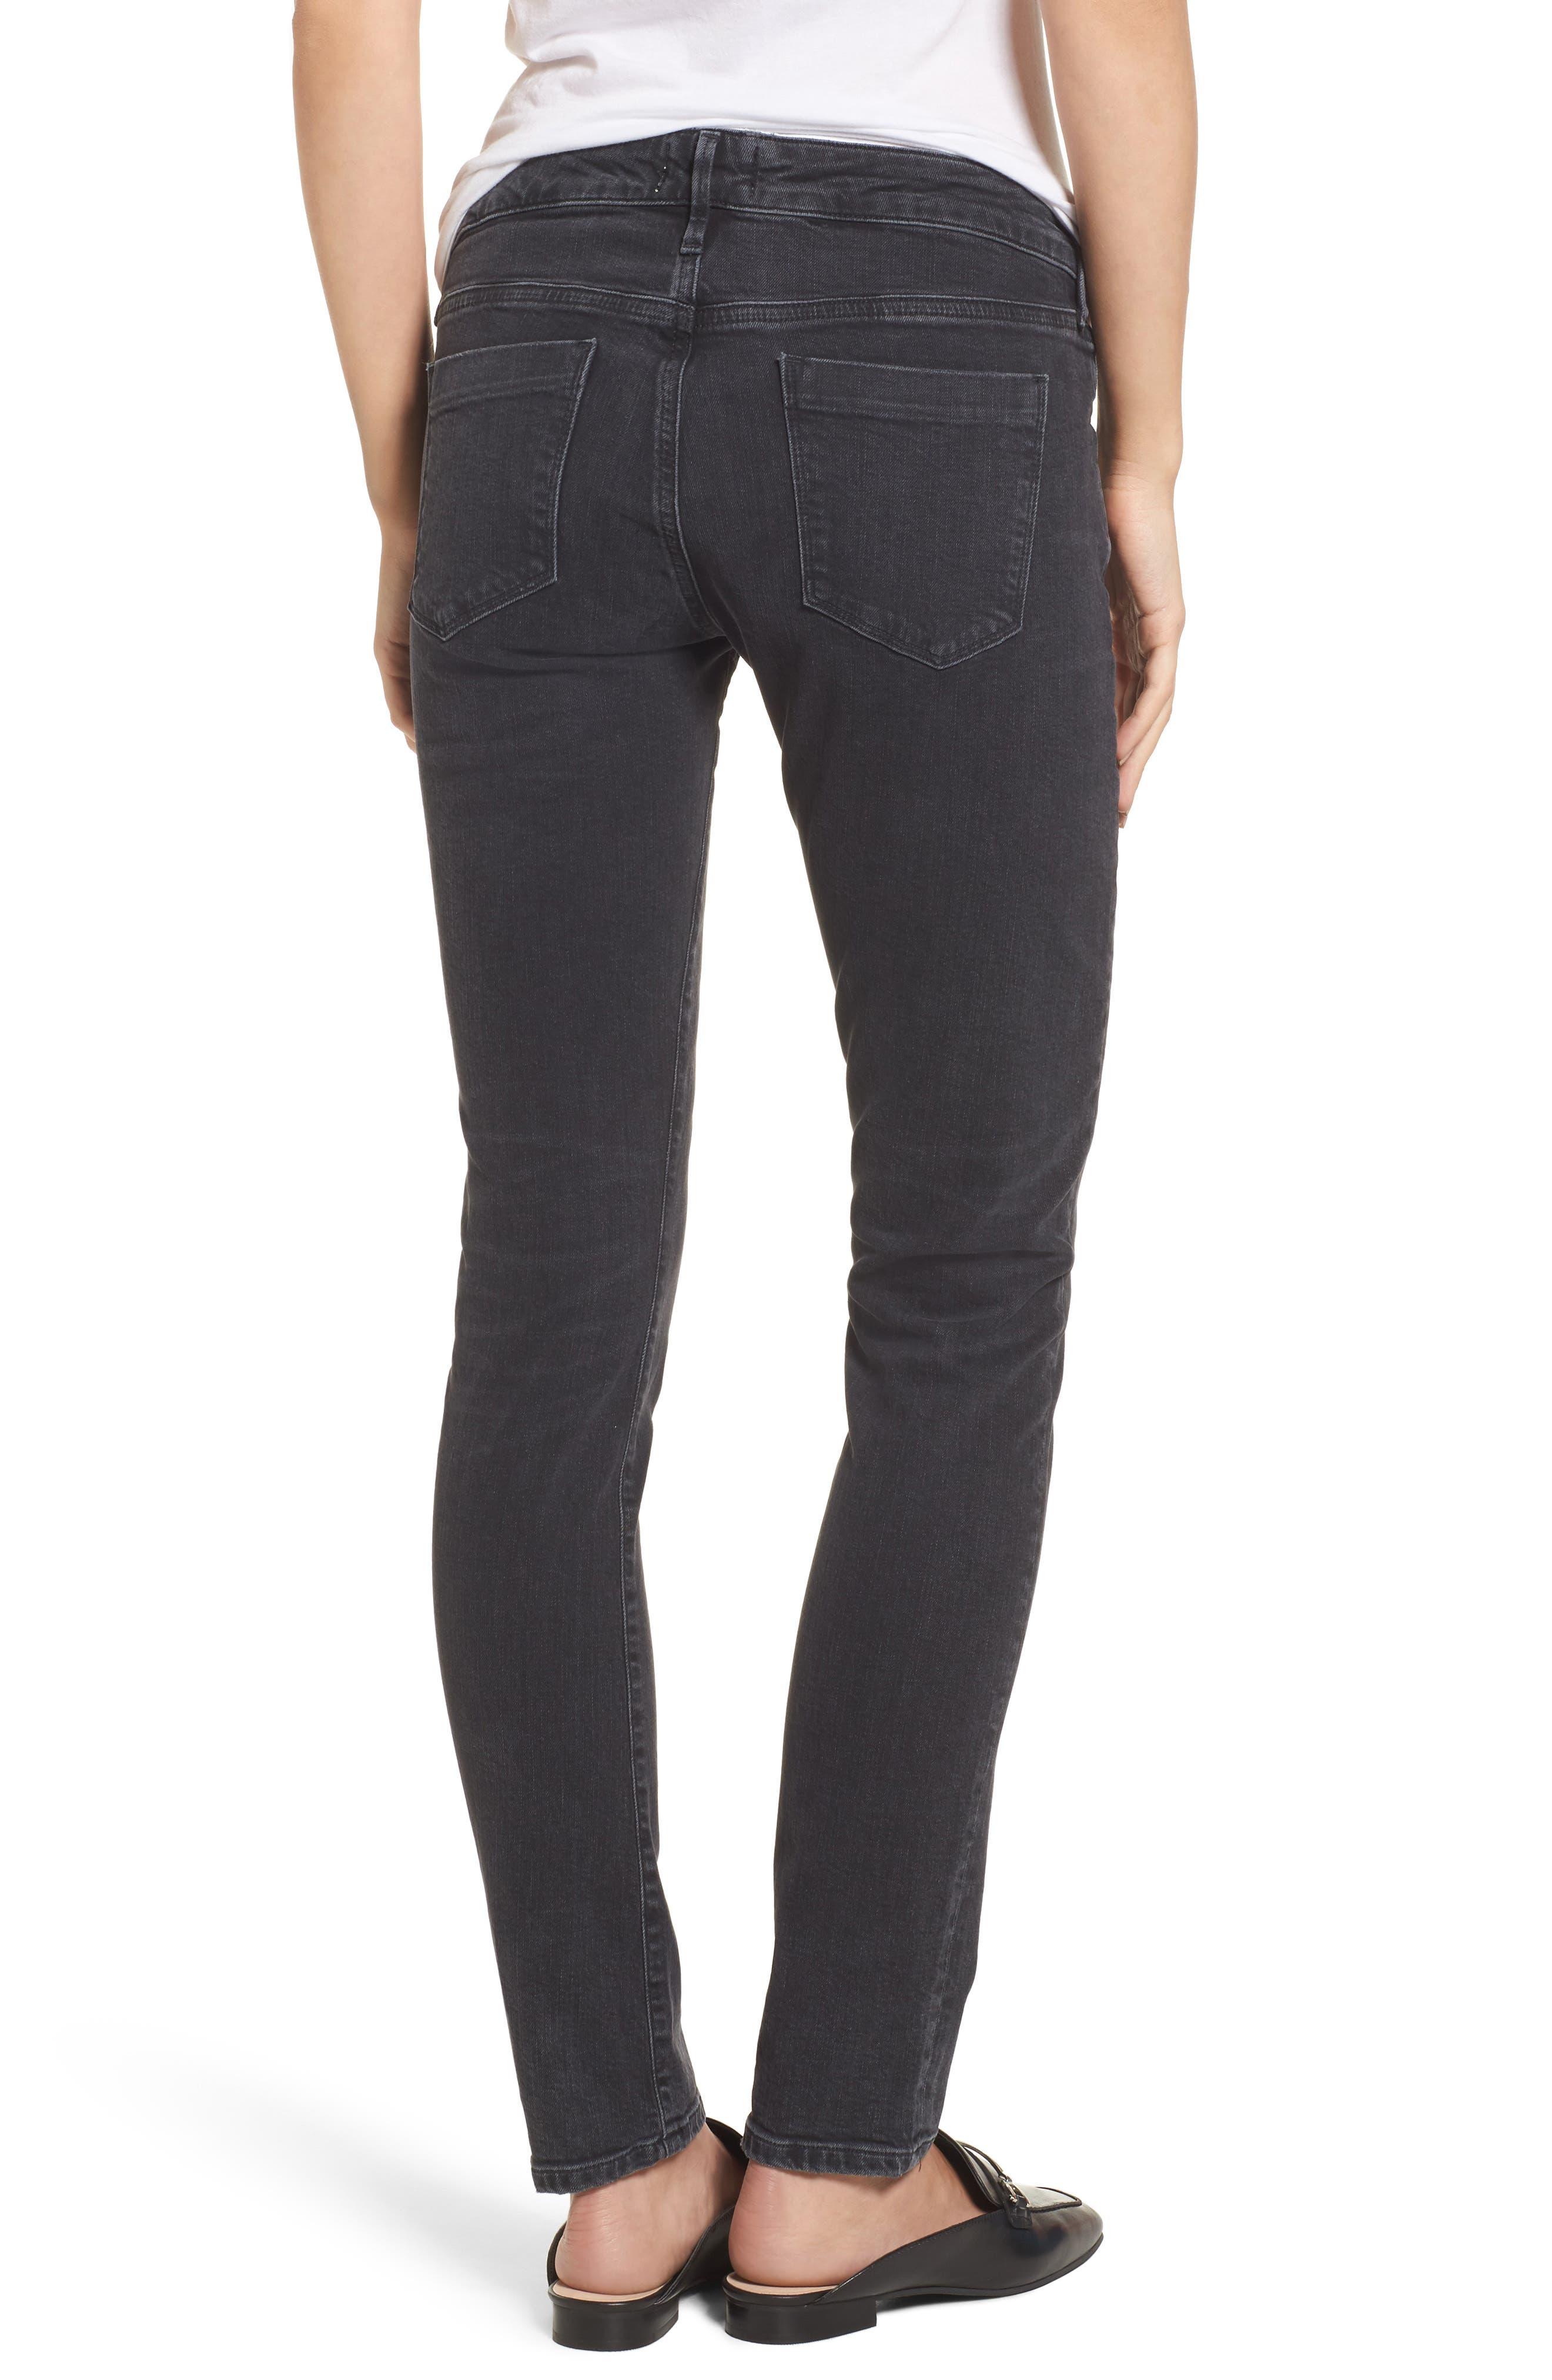 Chloe Low Rise Slim Jeans,                             Alternate thumbnail 2, color,                             072